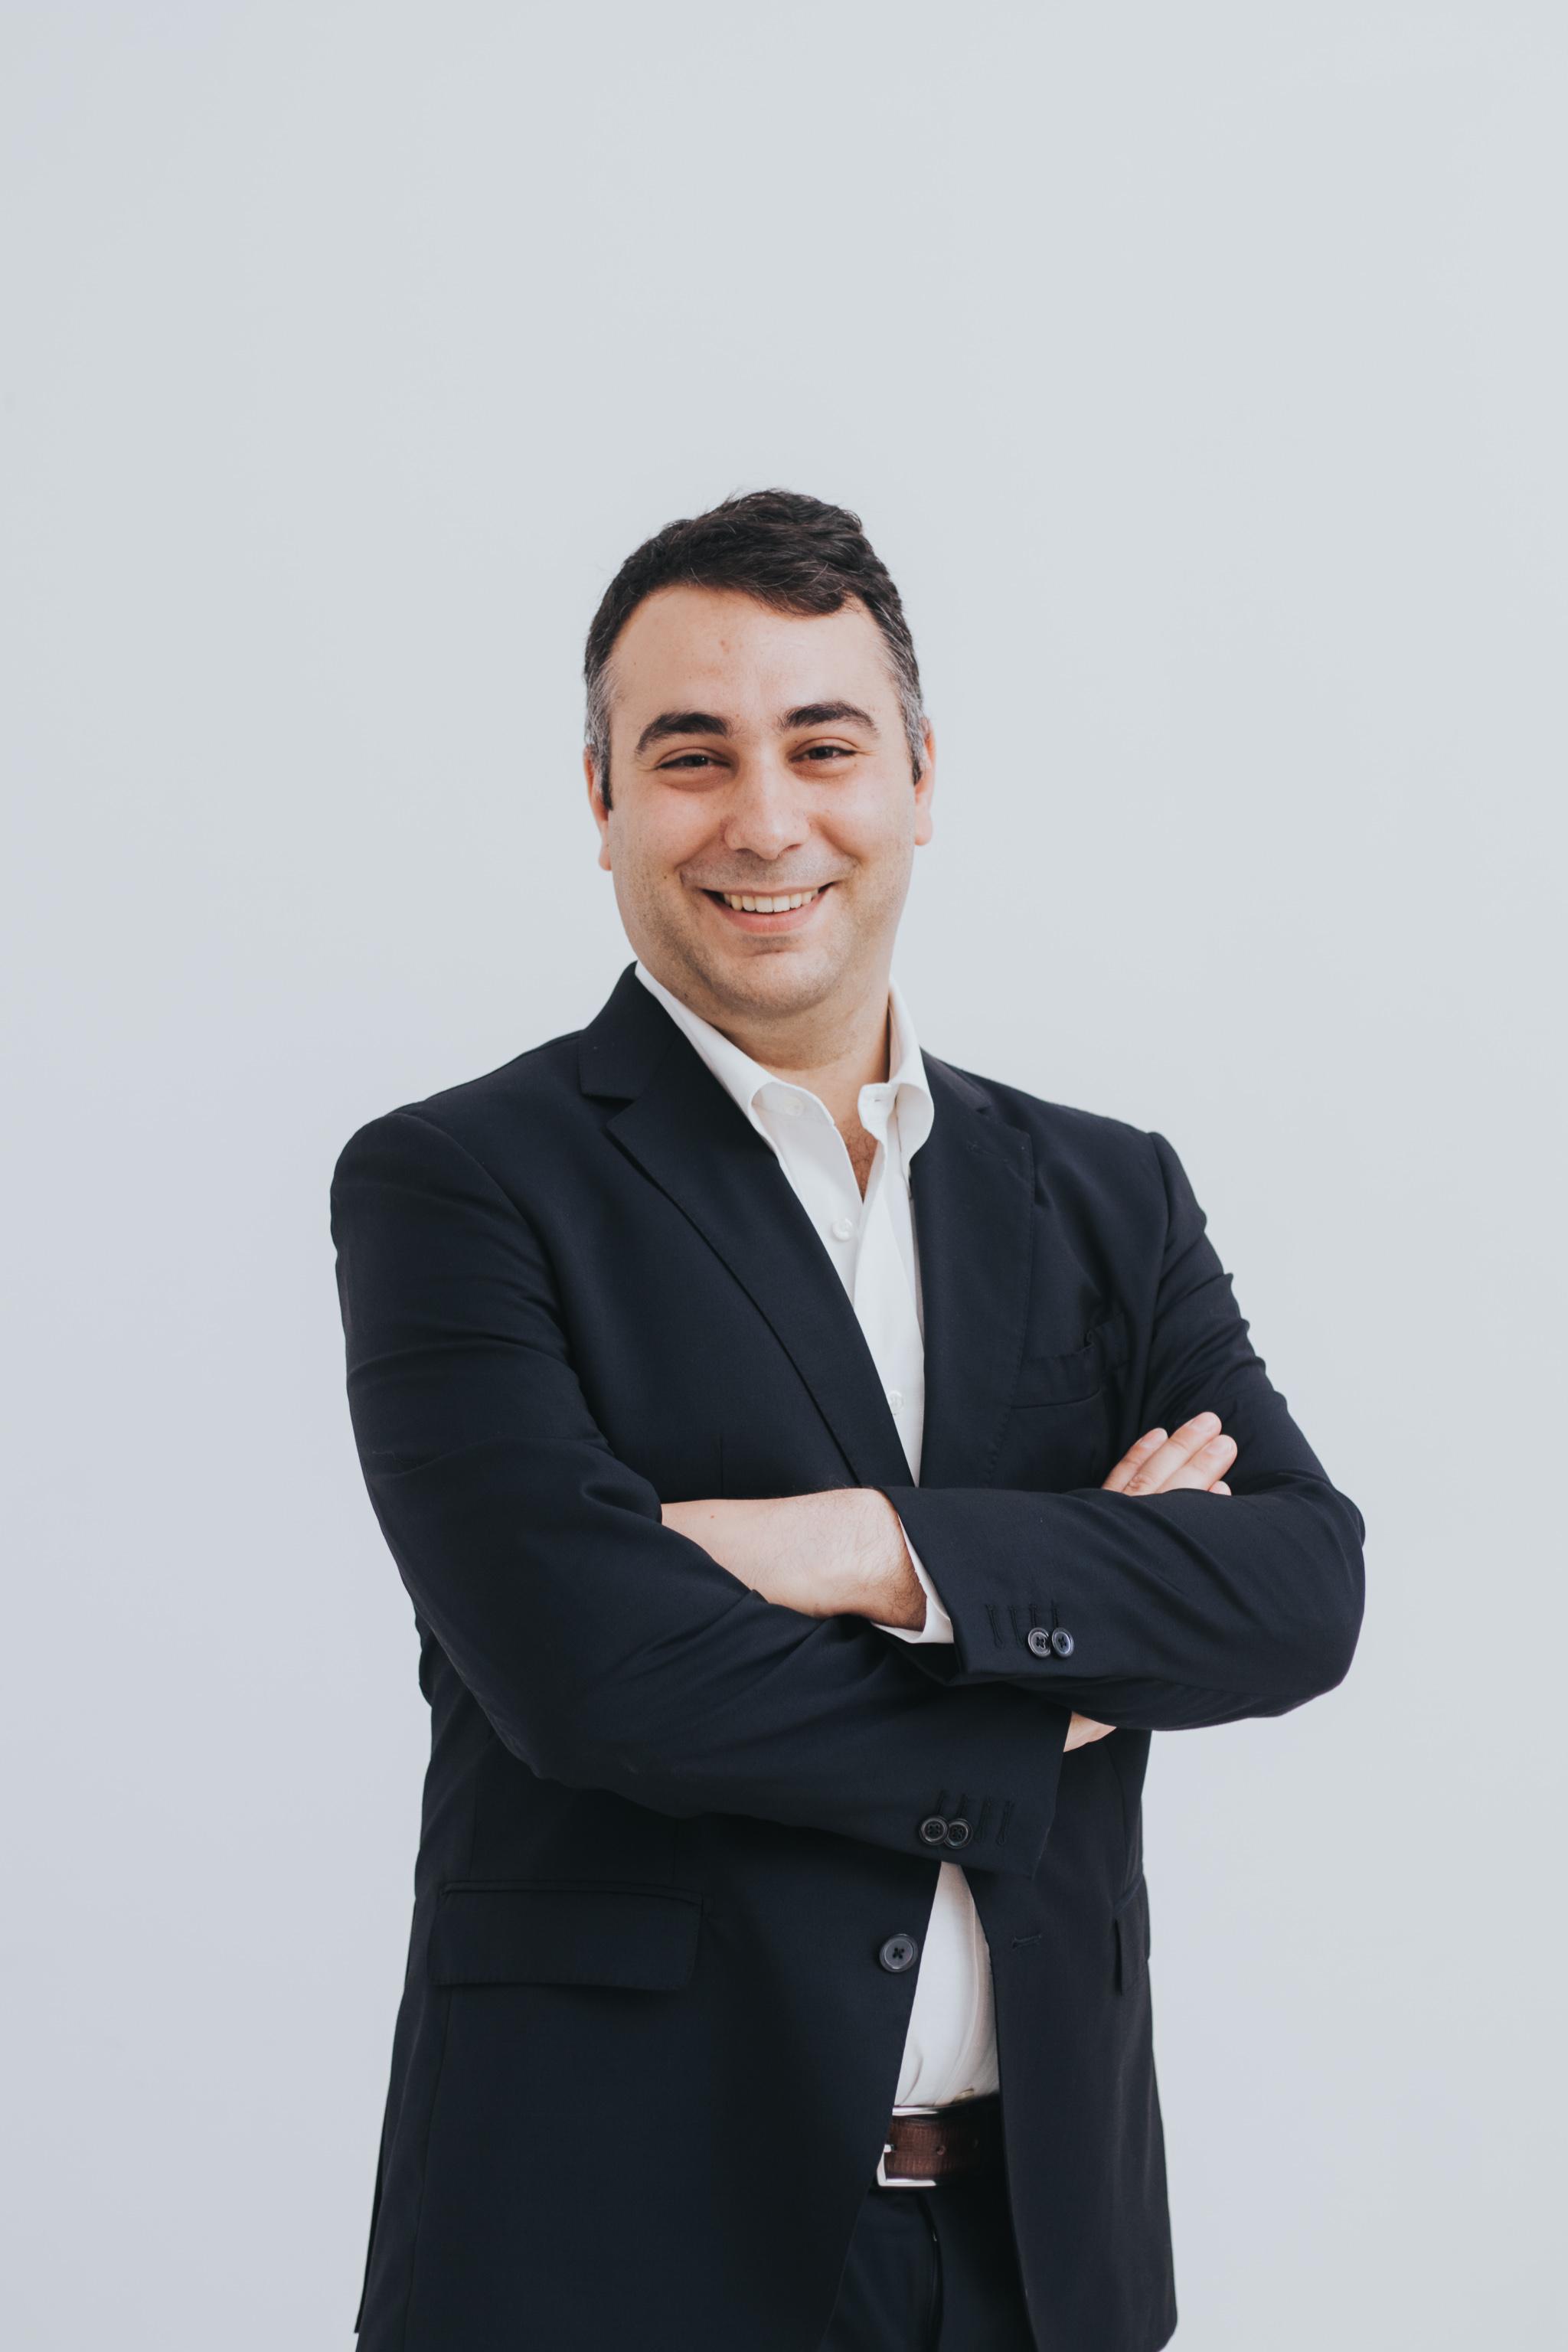 Ernesto Getino Gutiérrez